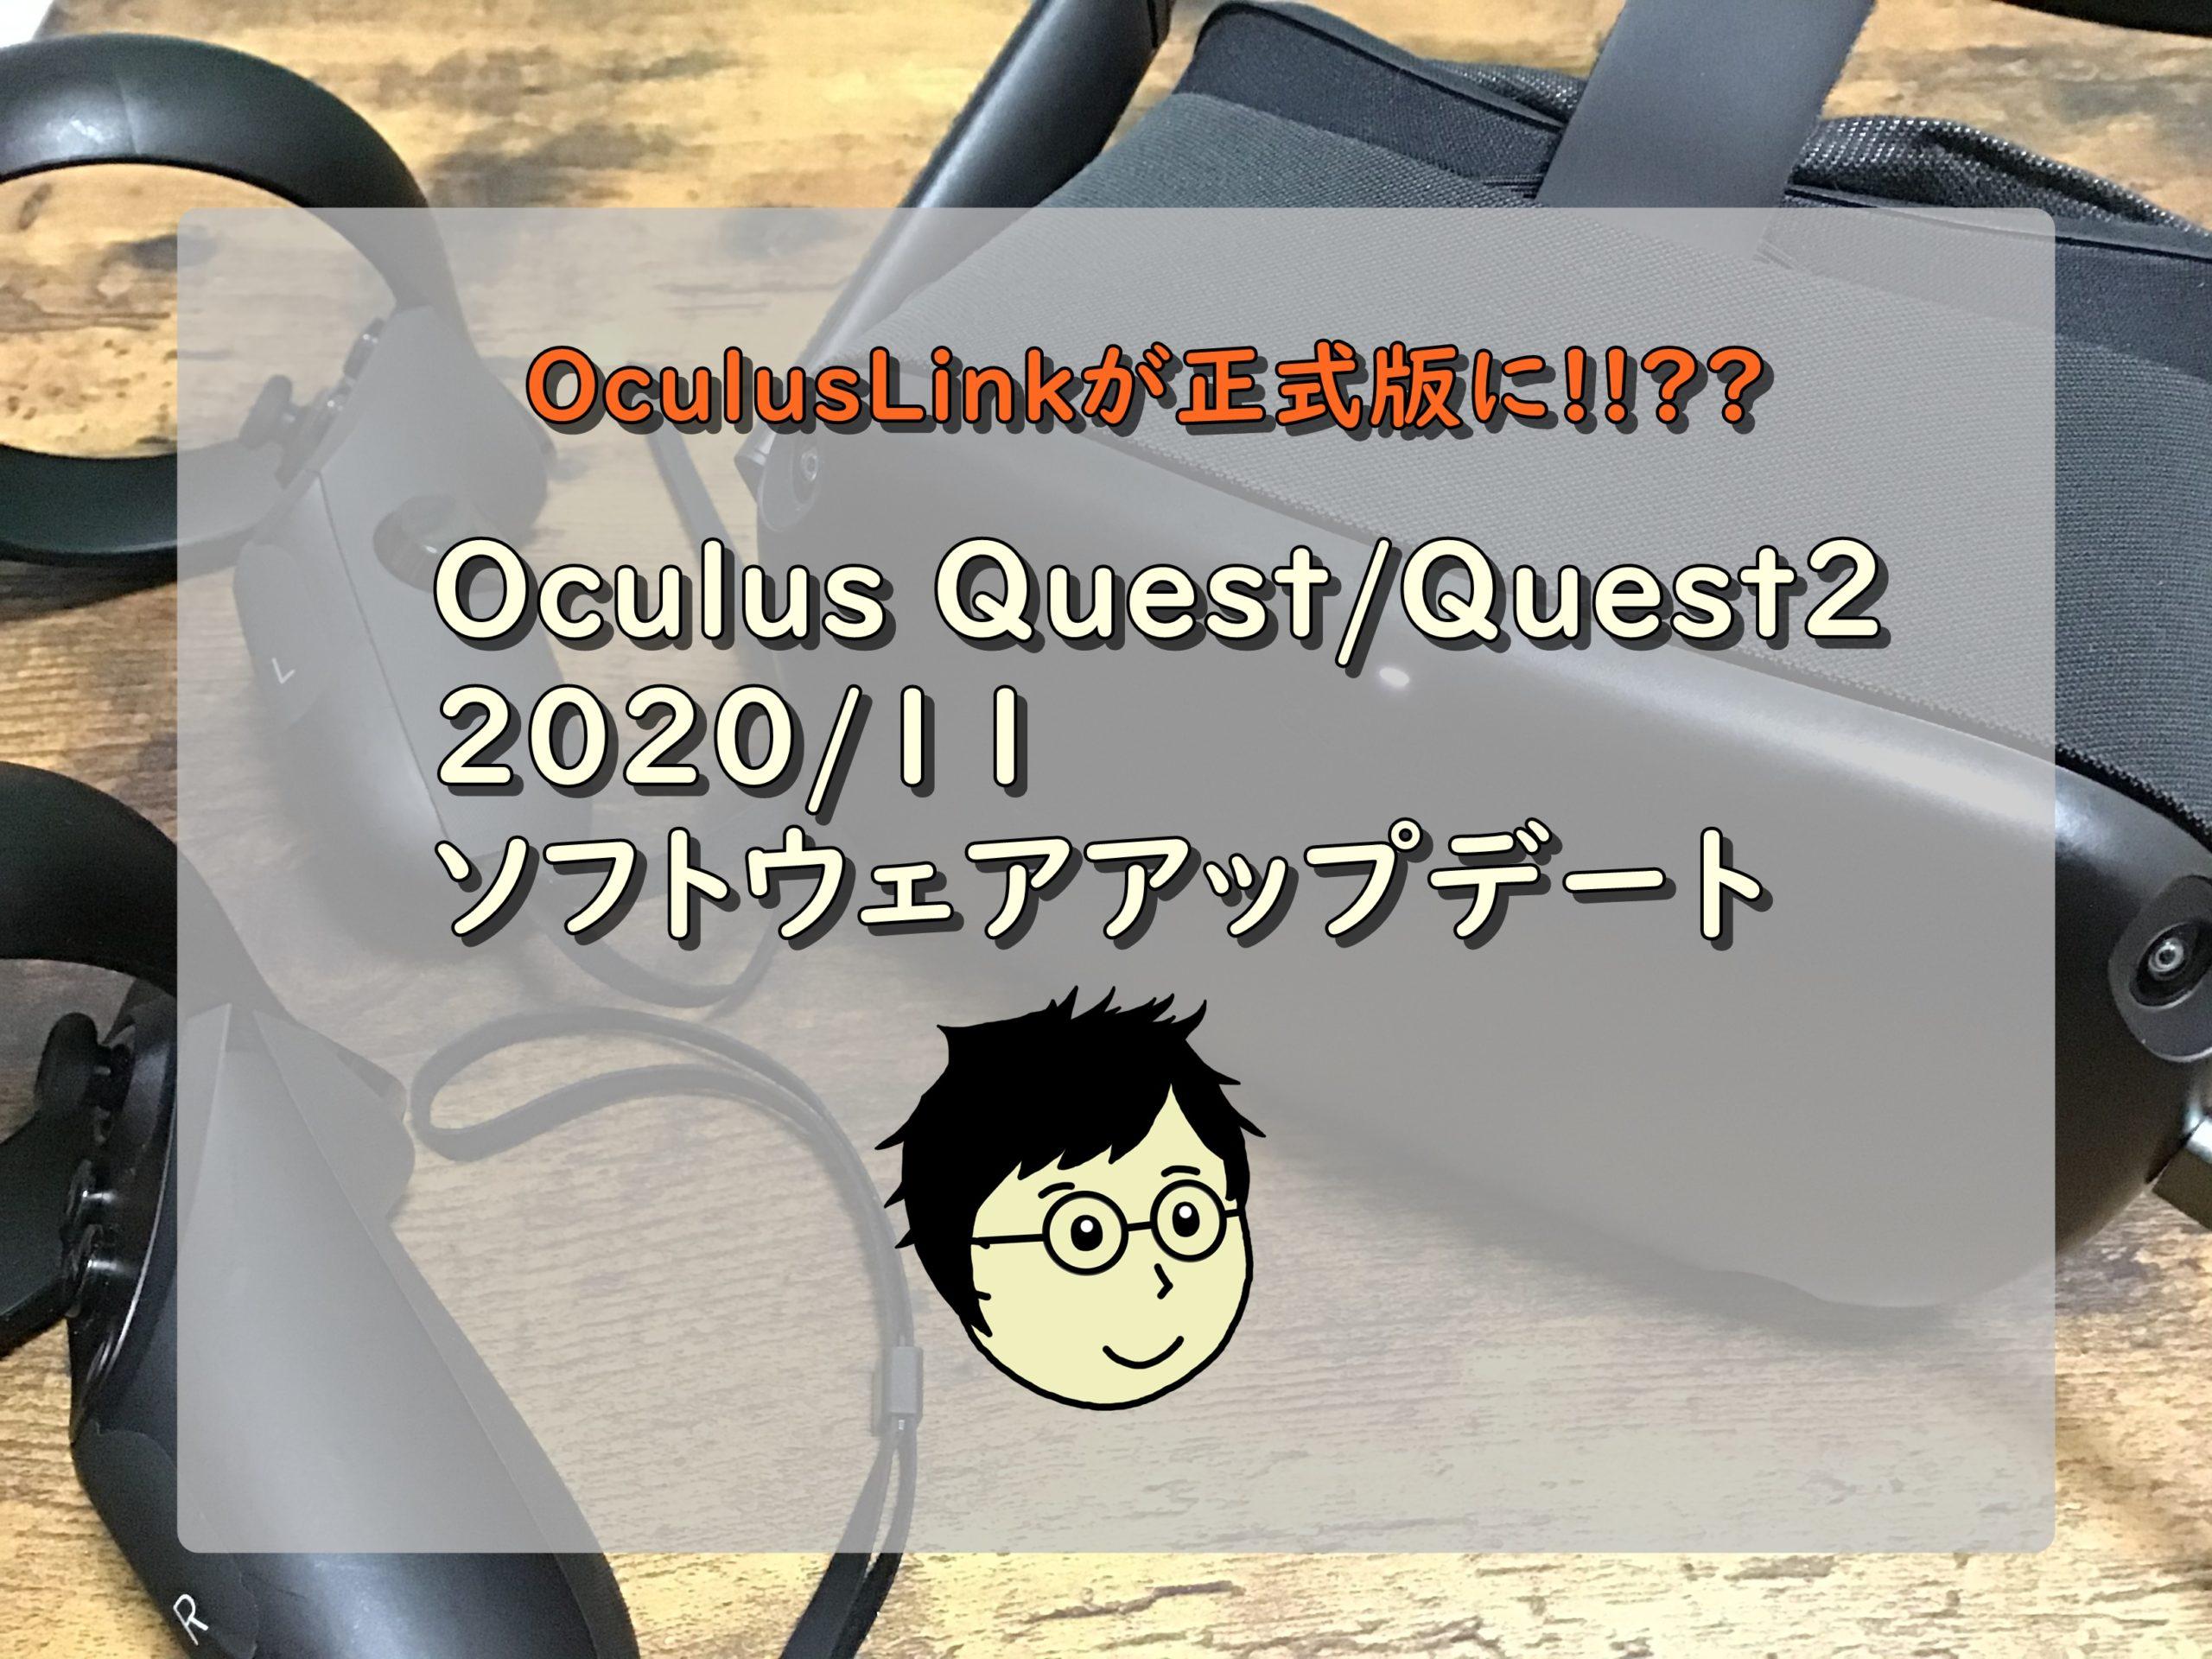 【Oculus Linkが正式版に】Quest/Quest2のアップデート(2020/11月)